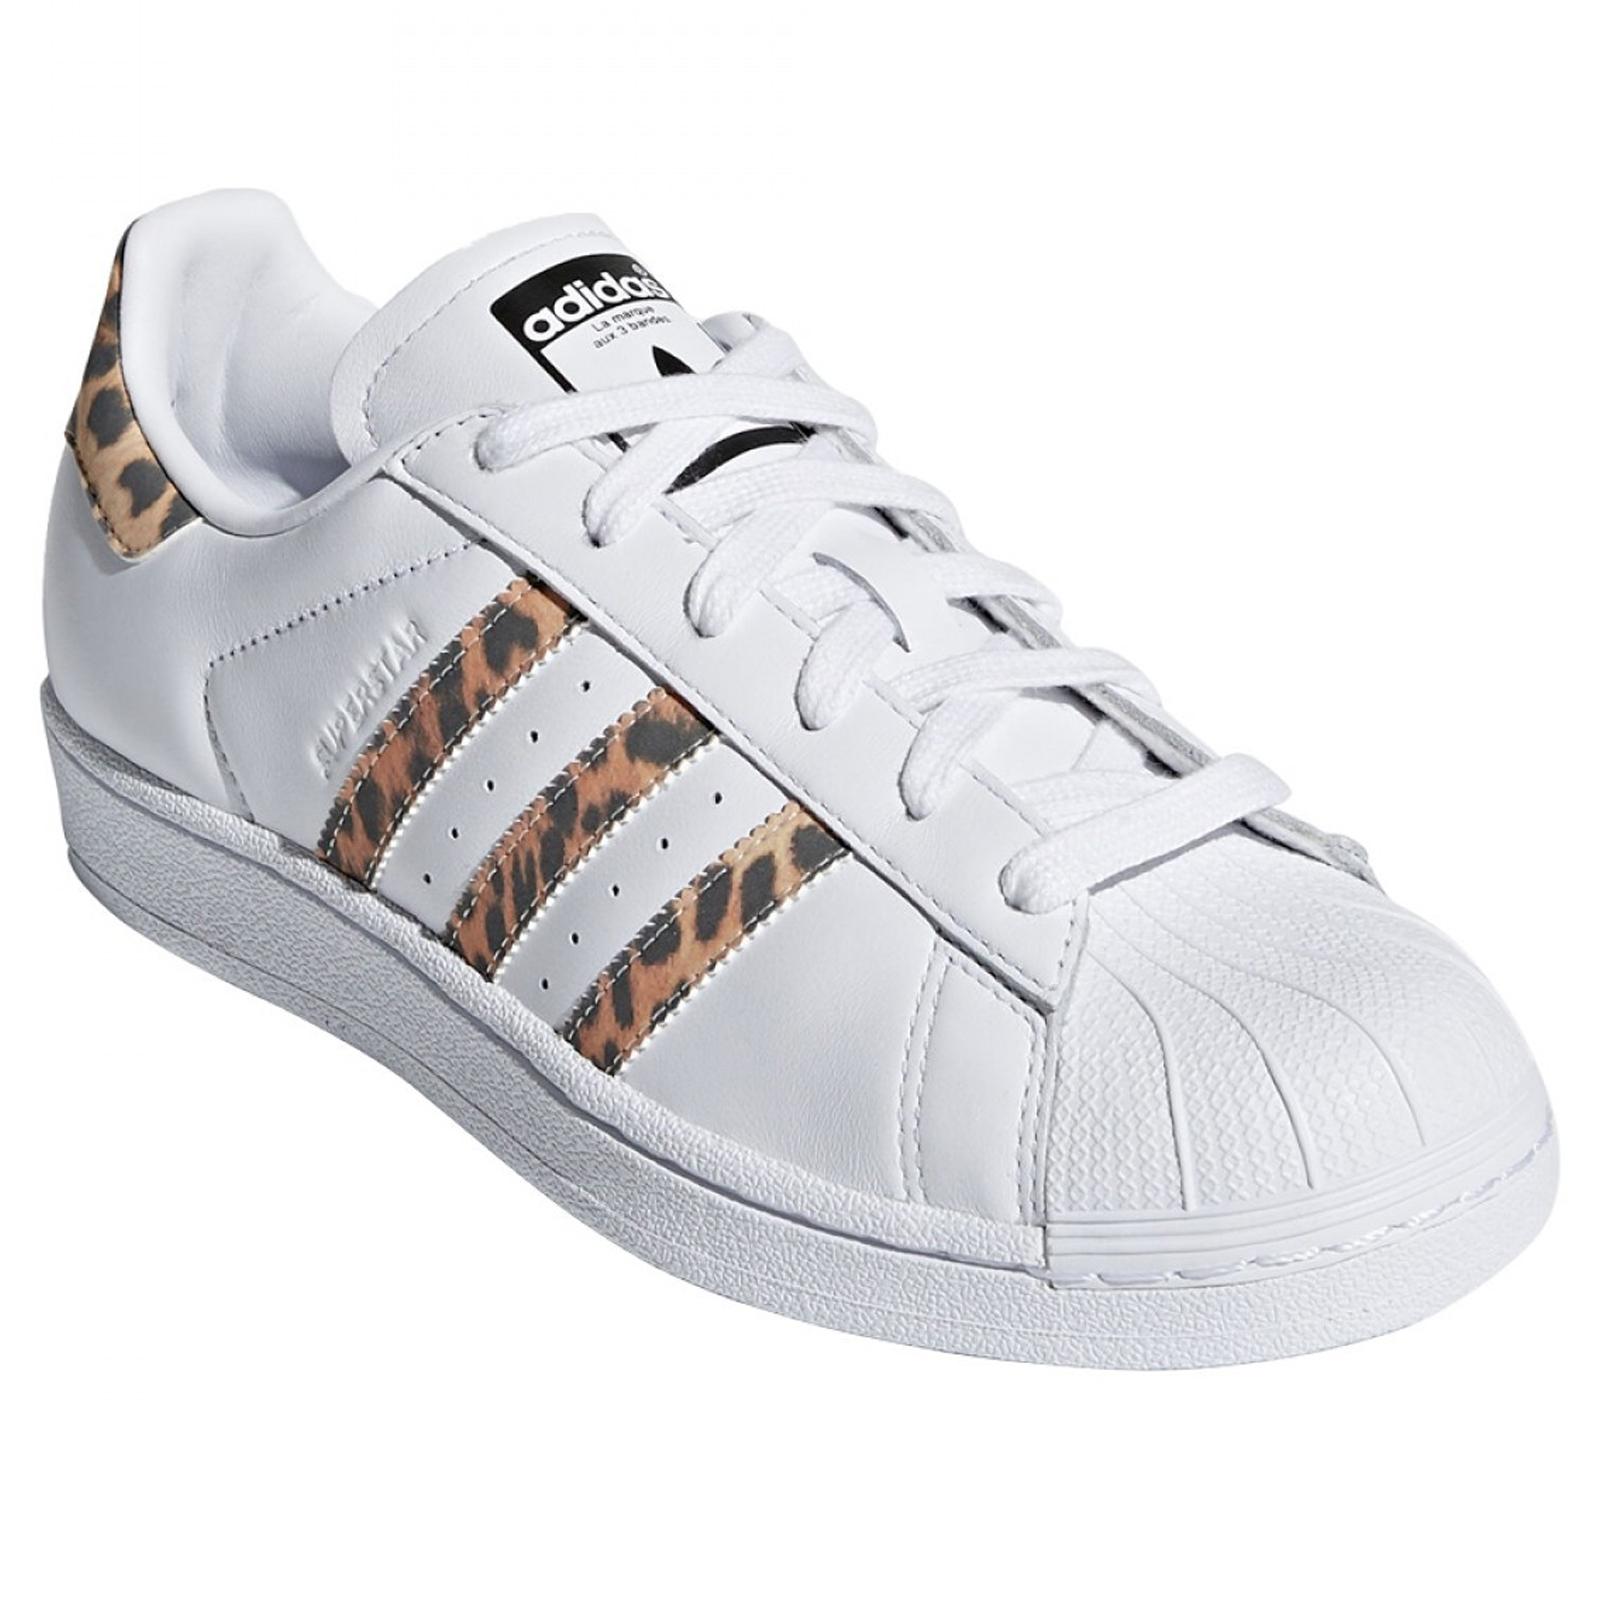 Details about Adidas Originals Superstar Leopard Leo Ponyhair Sneakers S78955 Shoes White show original title